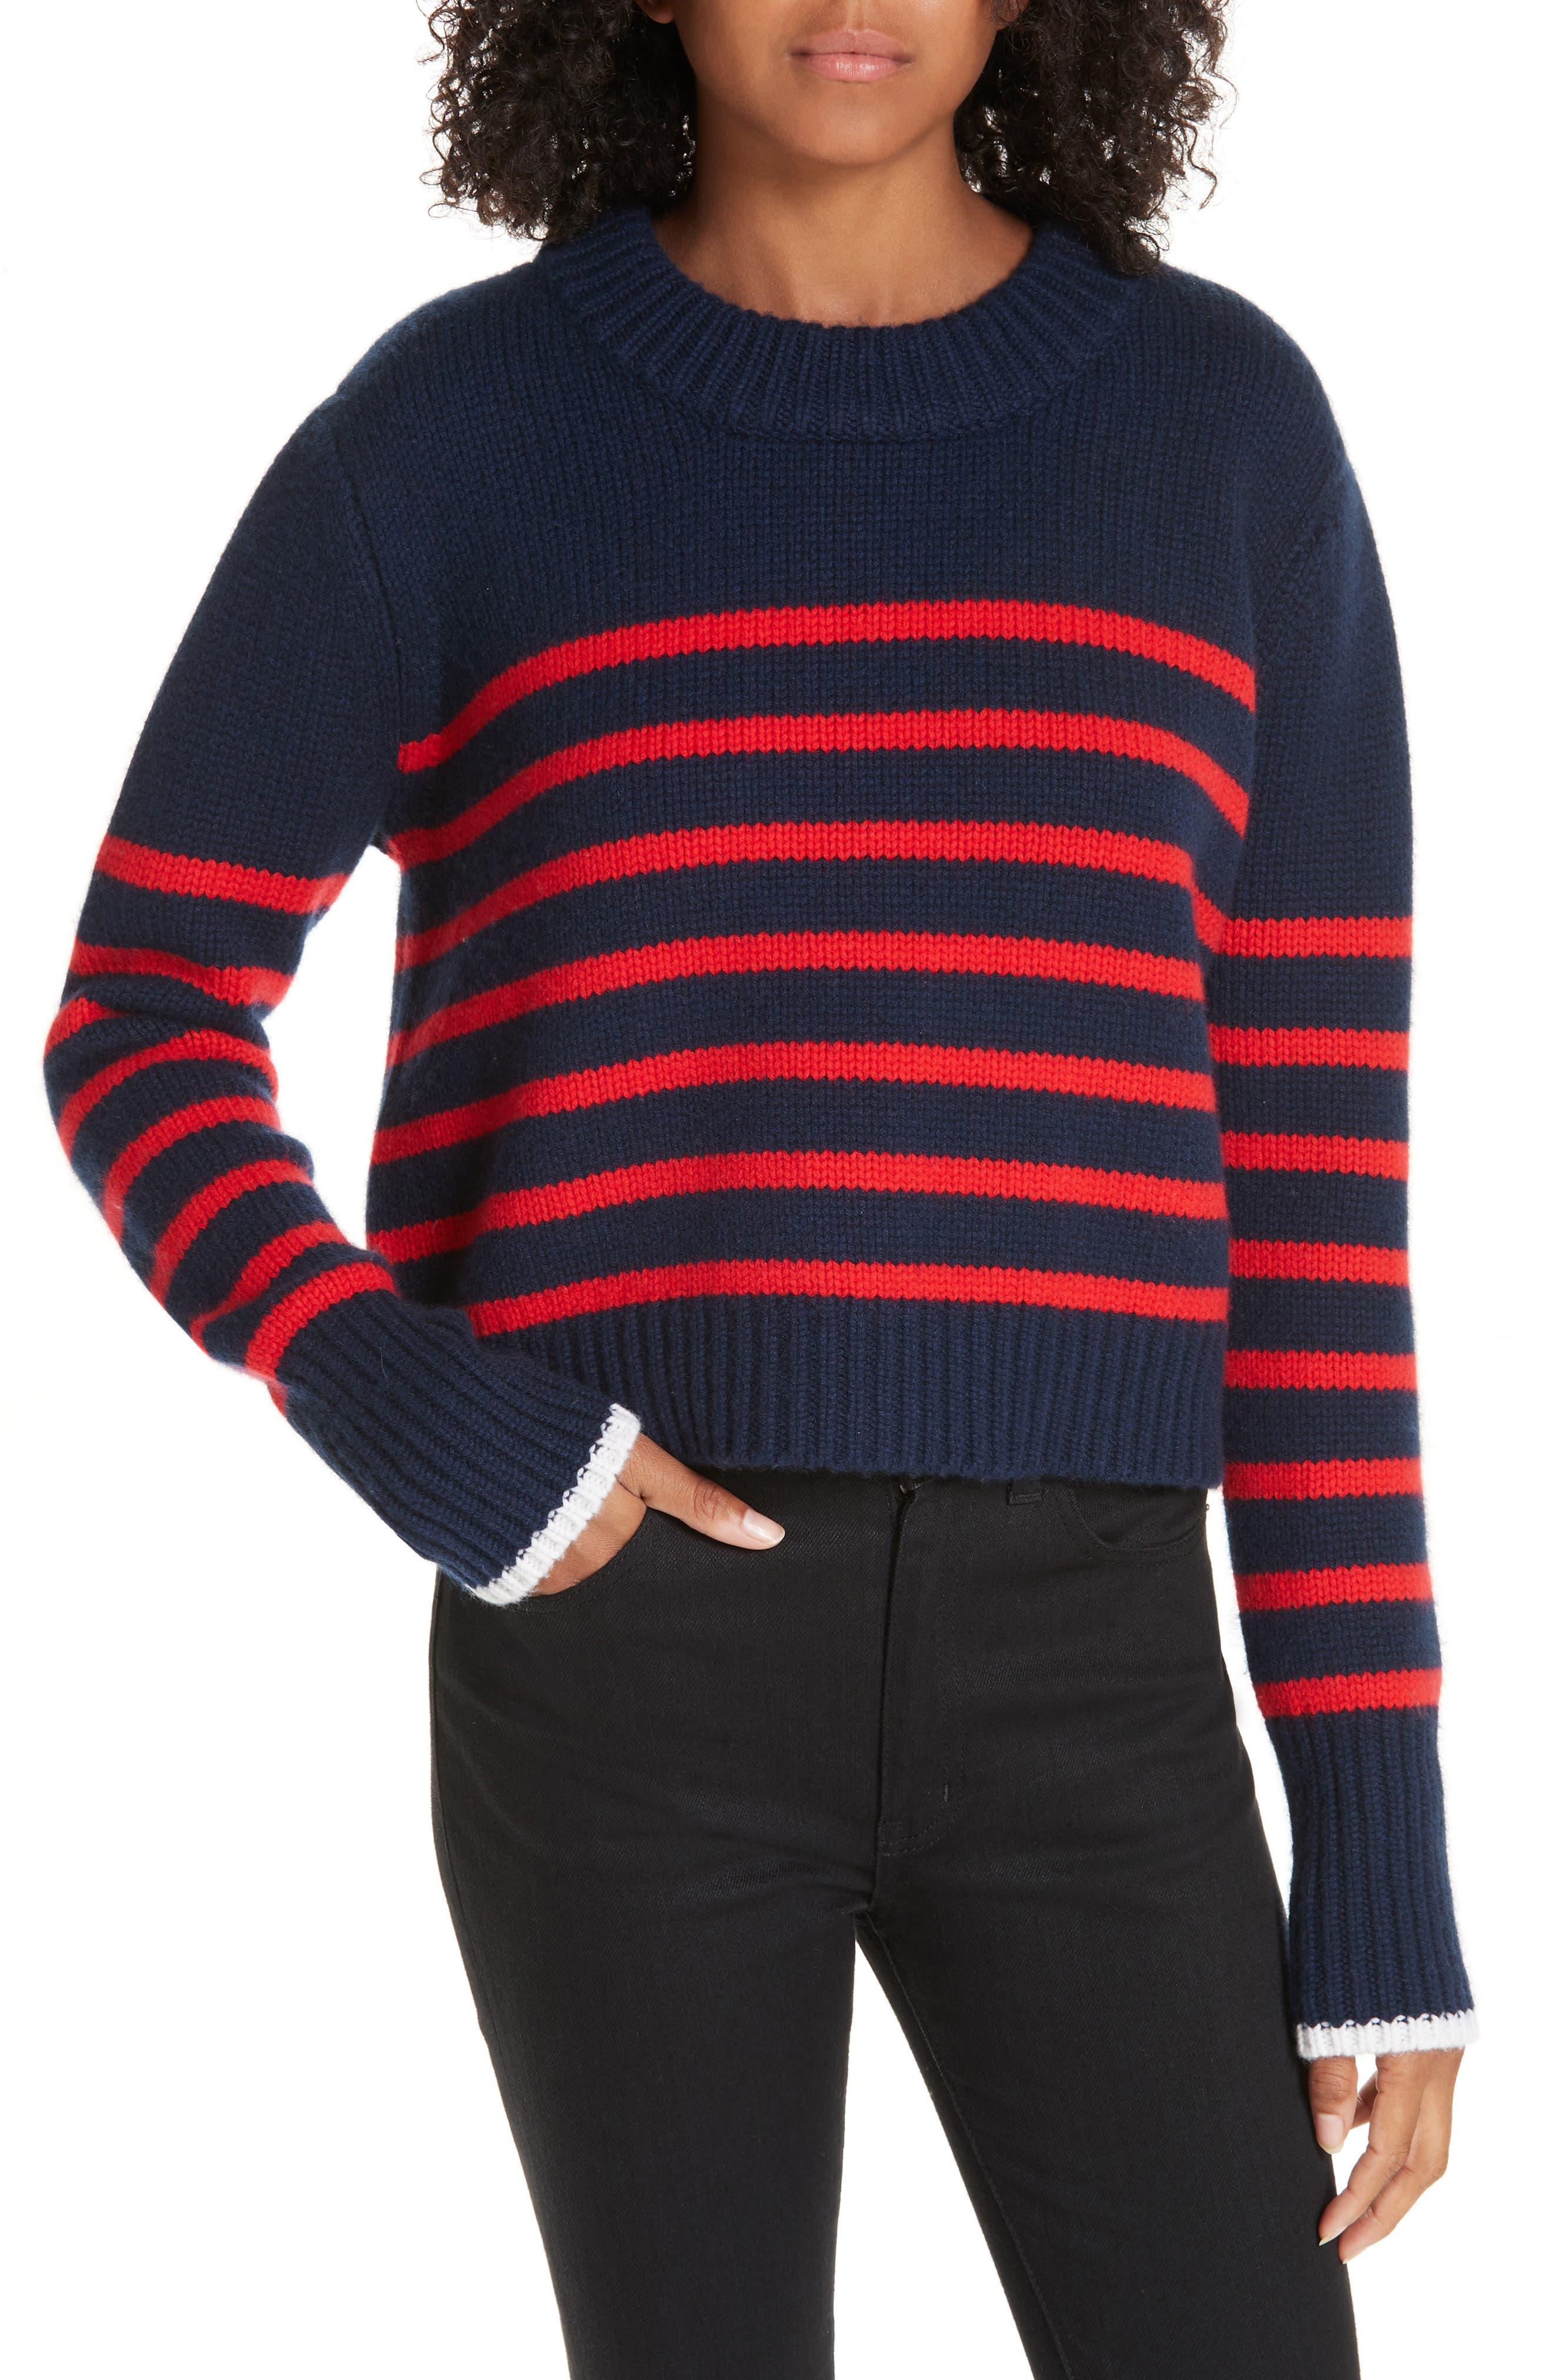 LA LIGNE Mini Maren Wool & Cashmere Sweater in Navy / Red